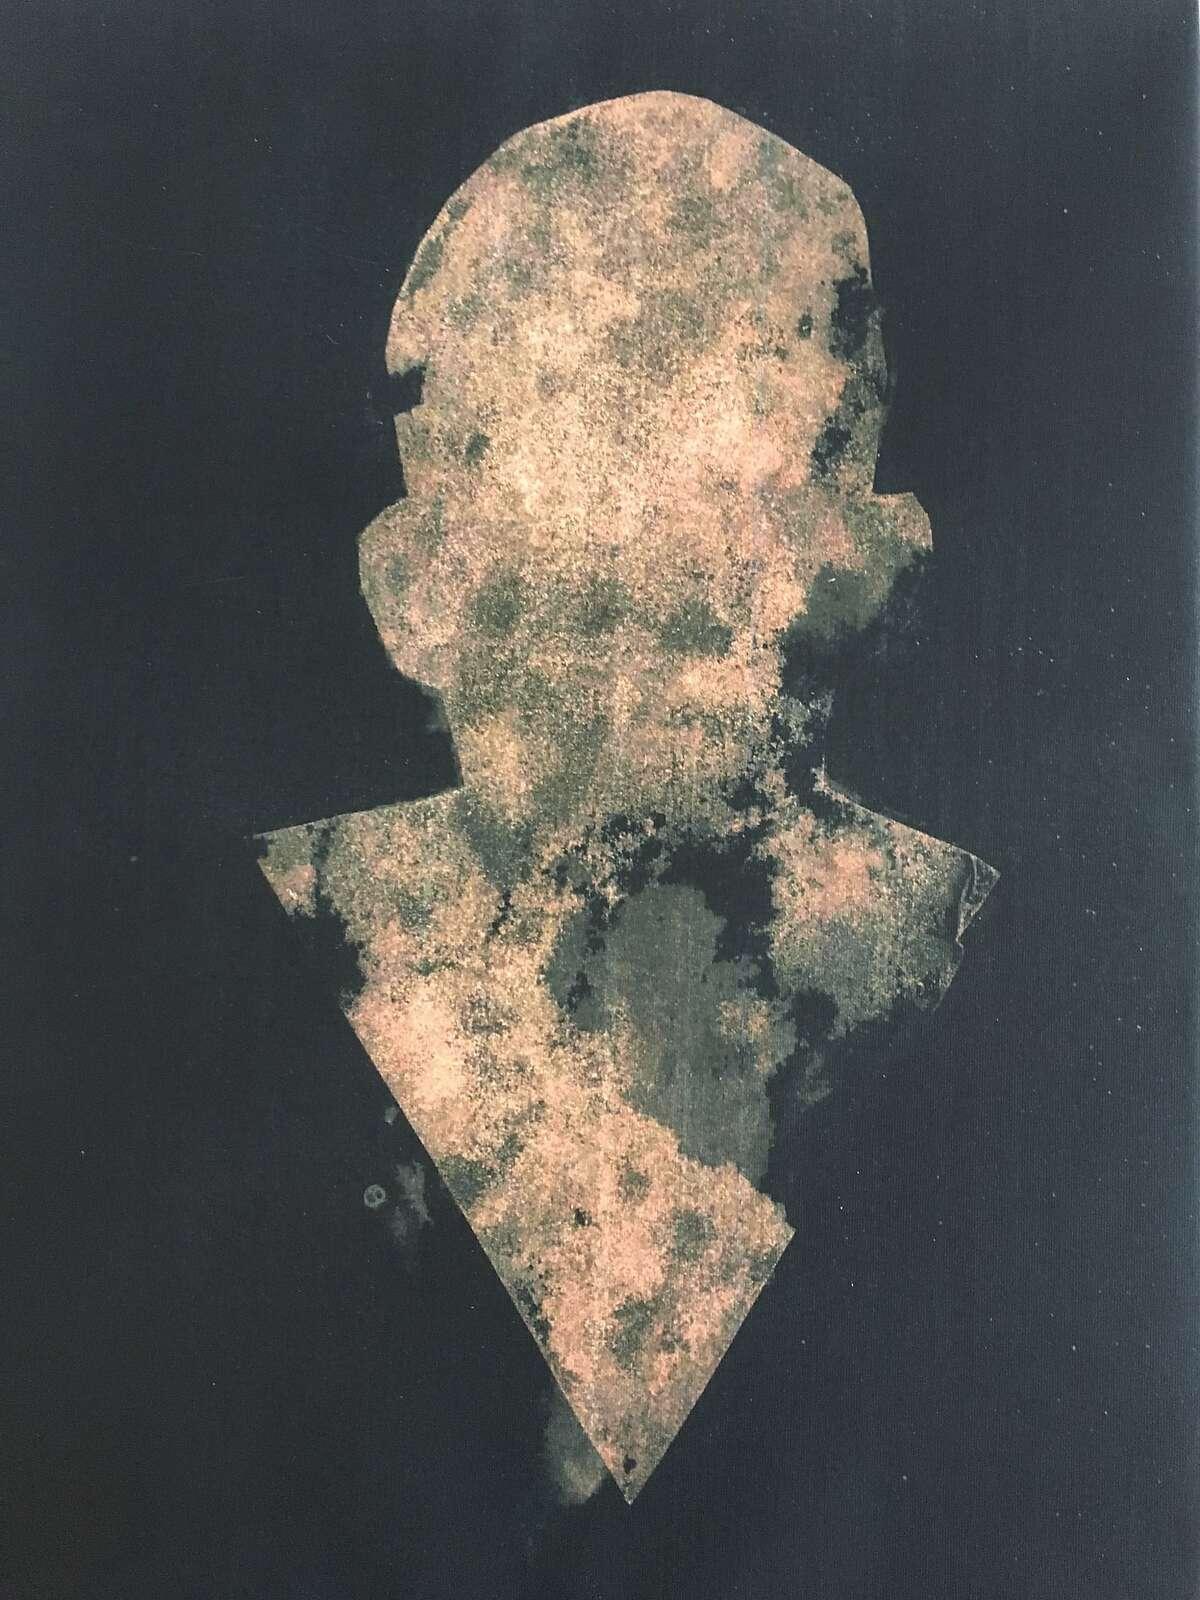 Self-Portrait (El Autorretrato) by Ren� Ya�ez. Paint on print. Mixed-media on canvas.